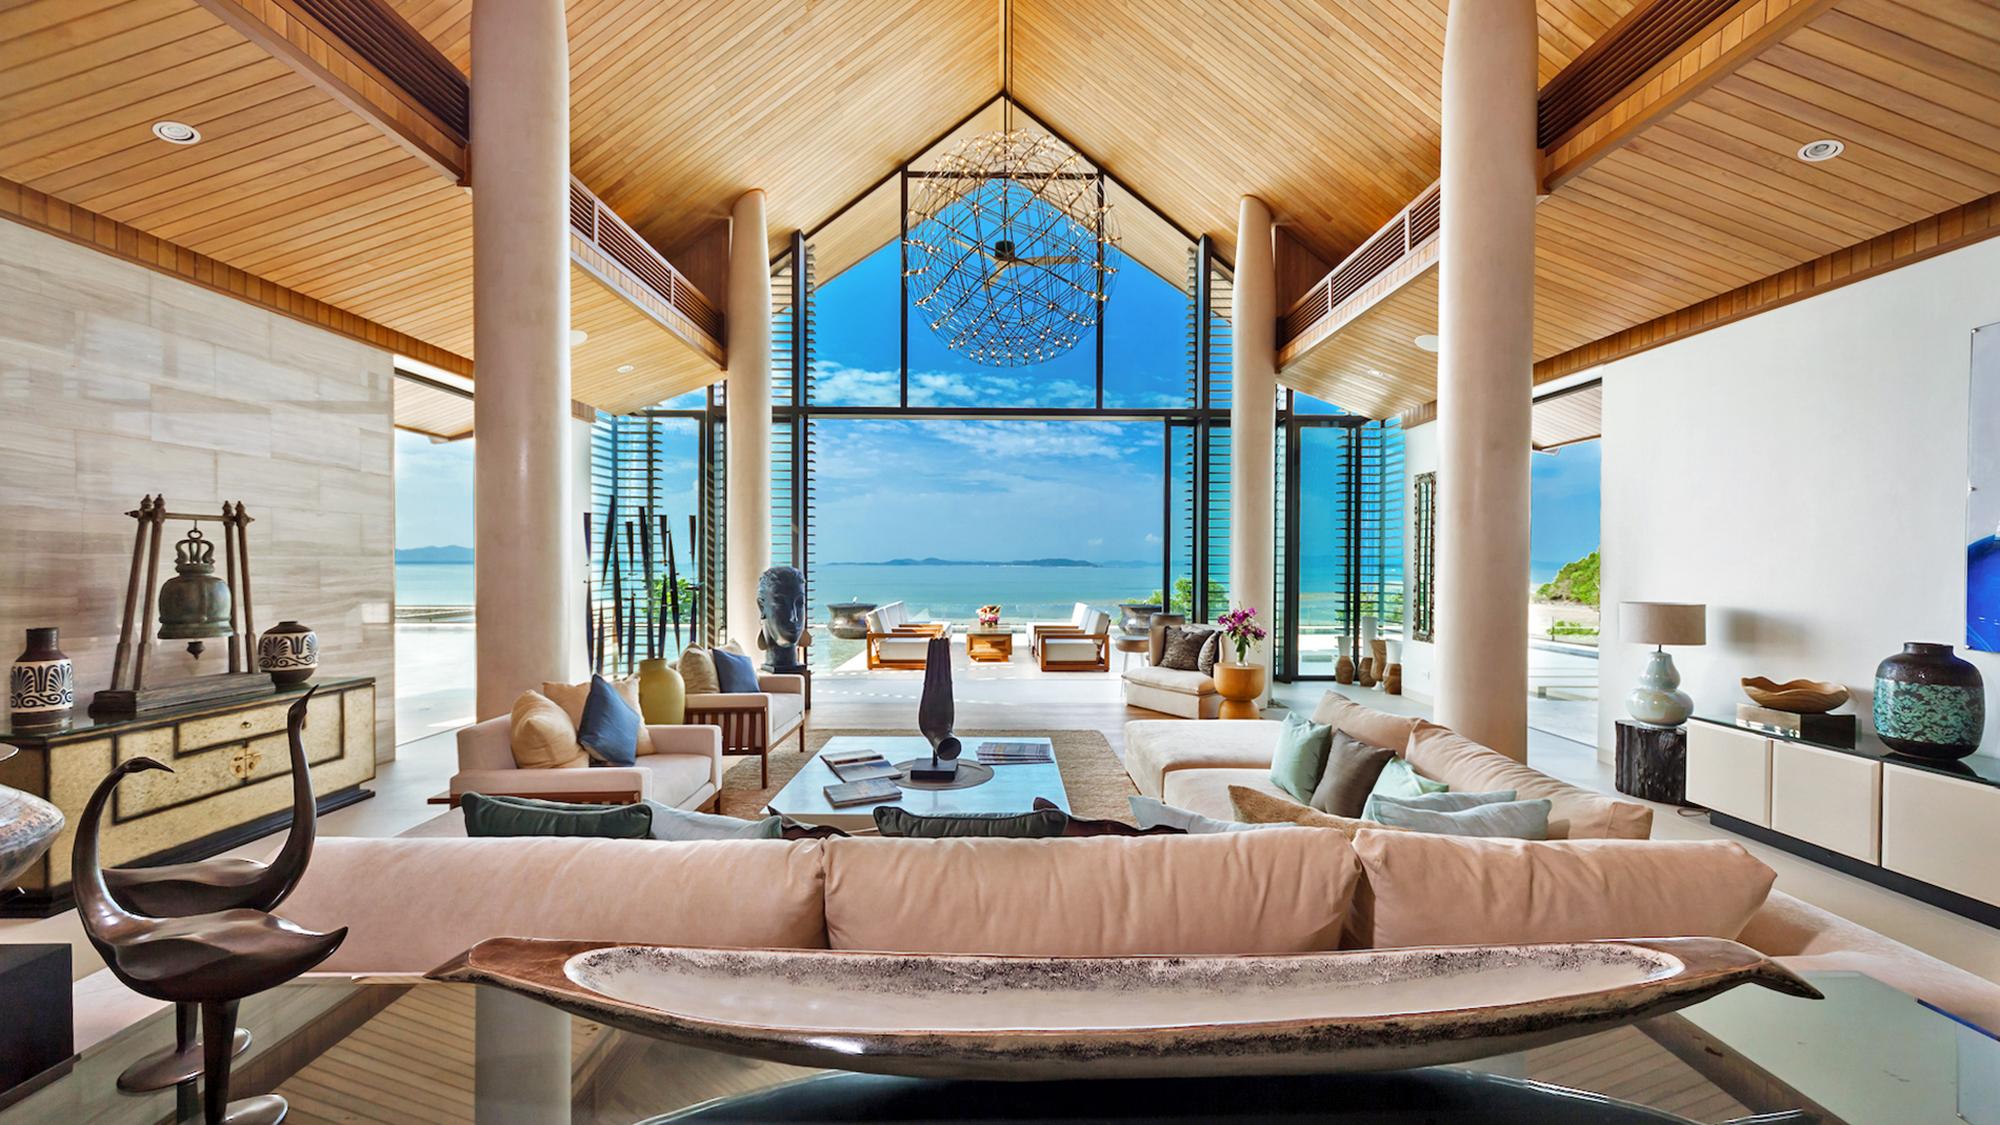 luxury retreats blurring lines